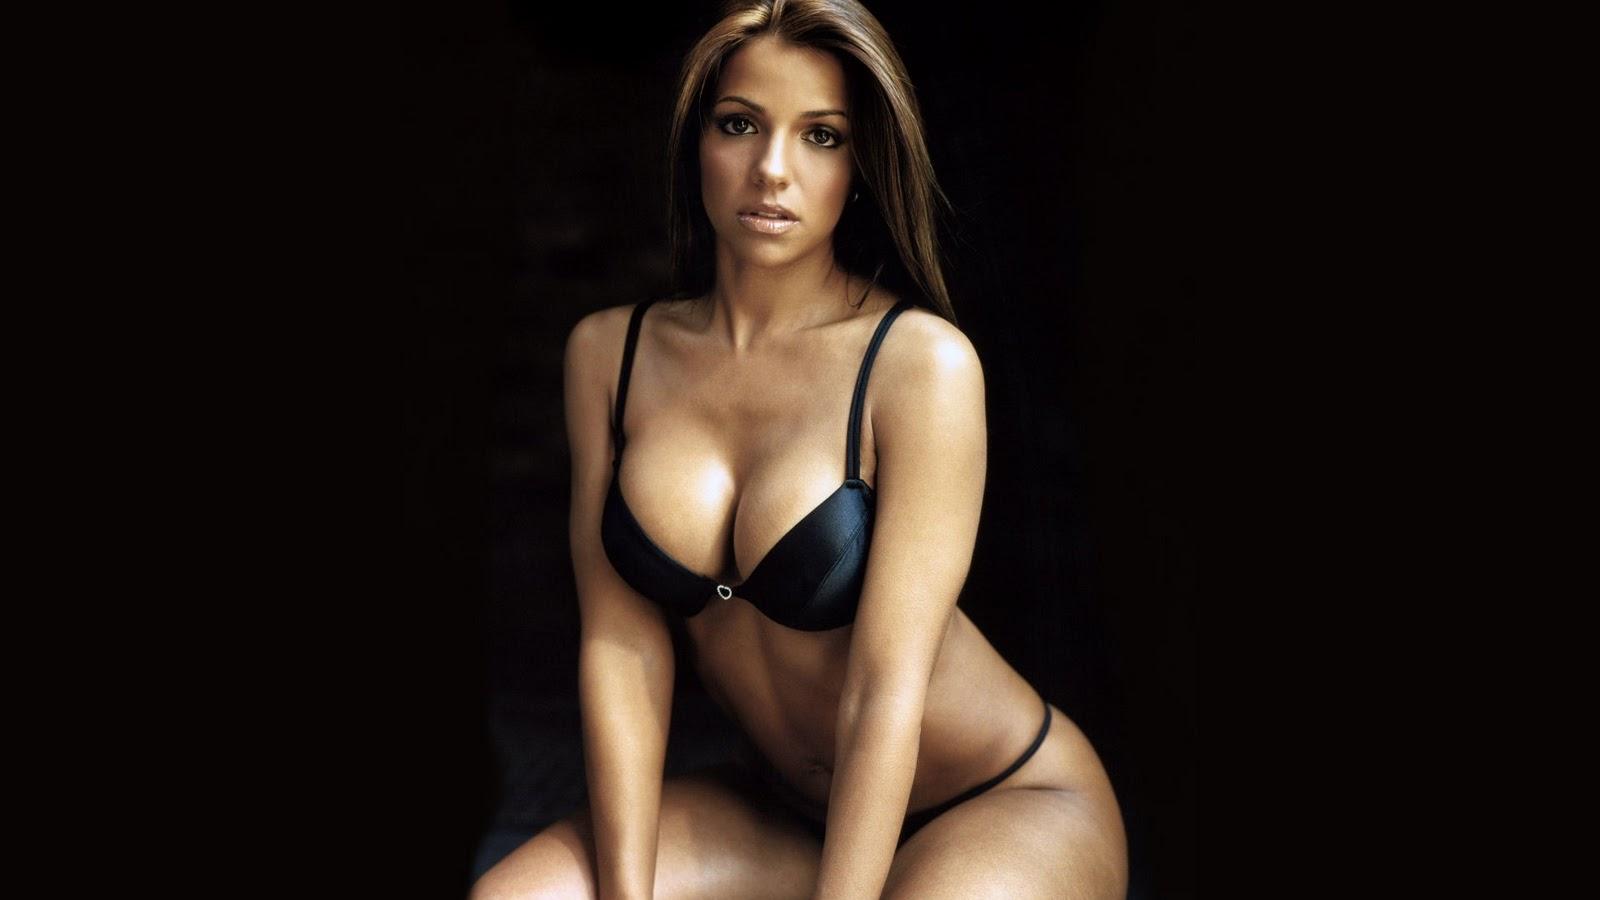 Sexy boner naked girls